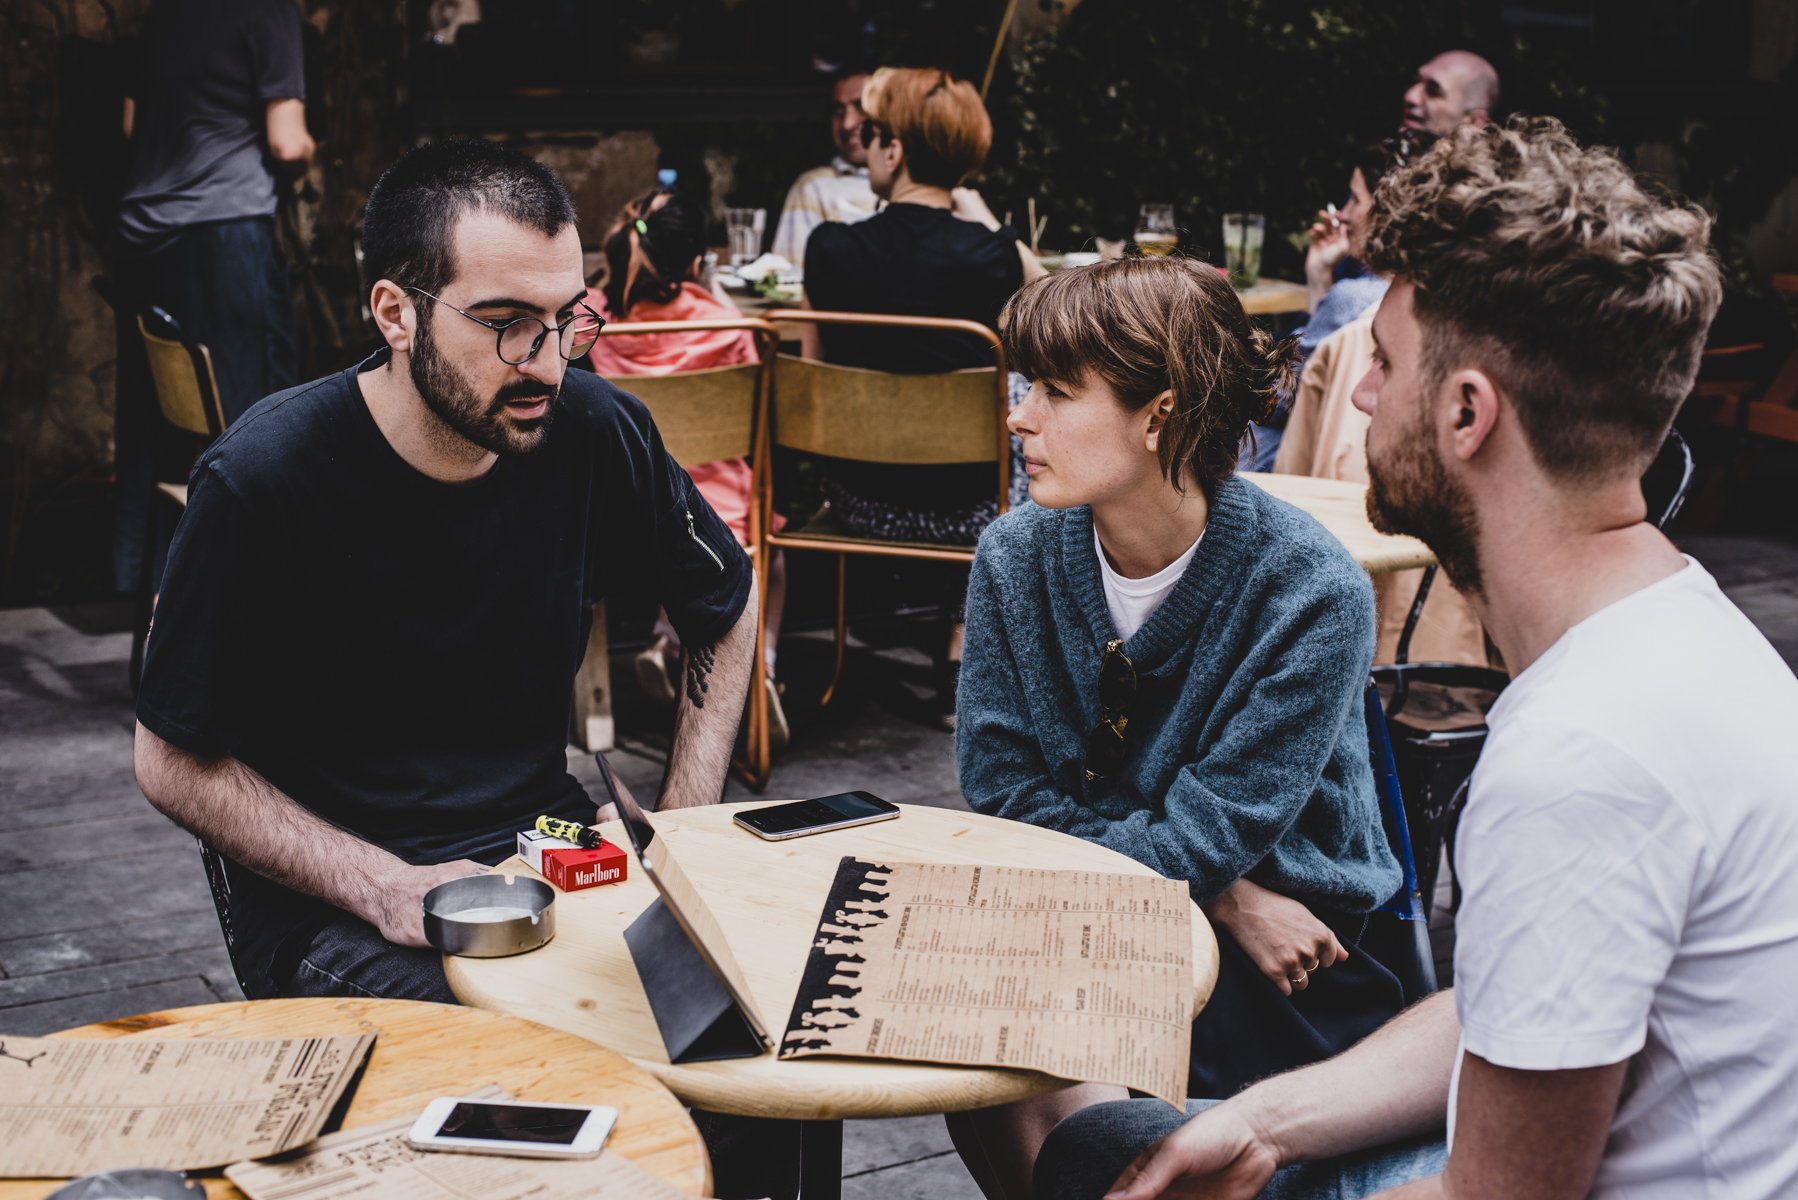 Interviewing Alexander Gabrichidze of KHIDI alongside Najaaraq Vestbirk, aka Courtesy, Tbilisi, May 2018. Photograph:  Kasia Zacharko